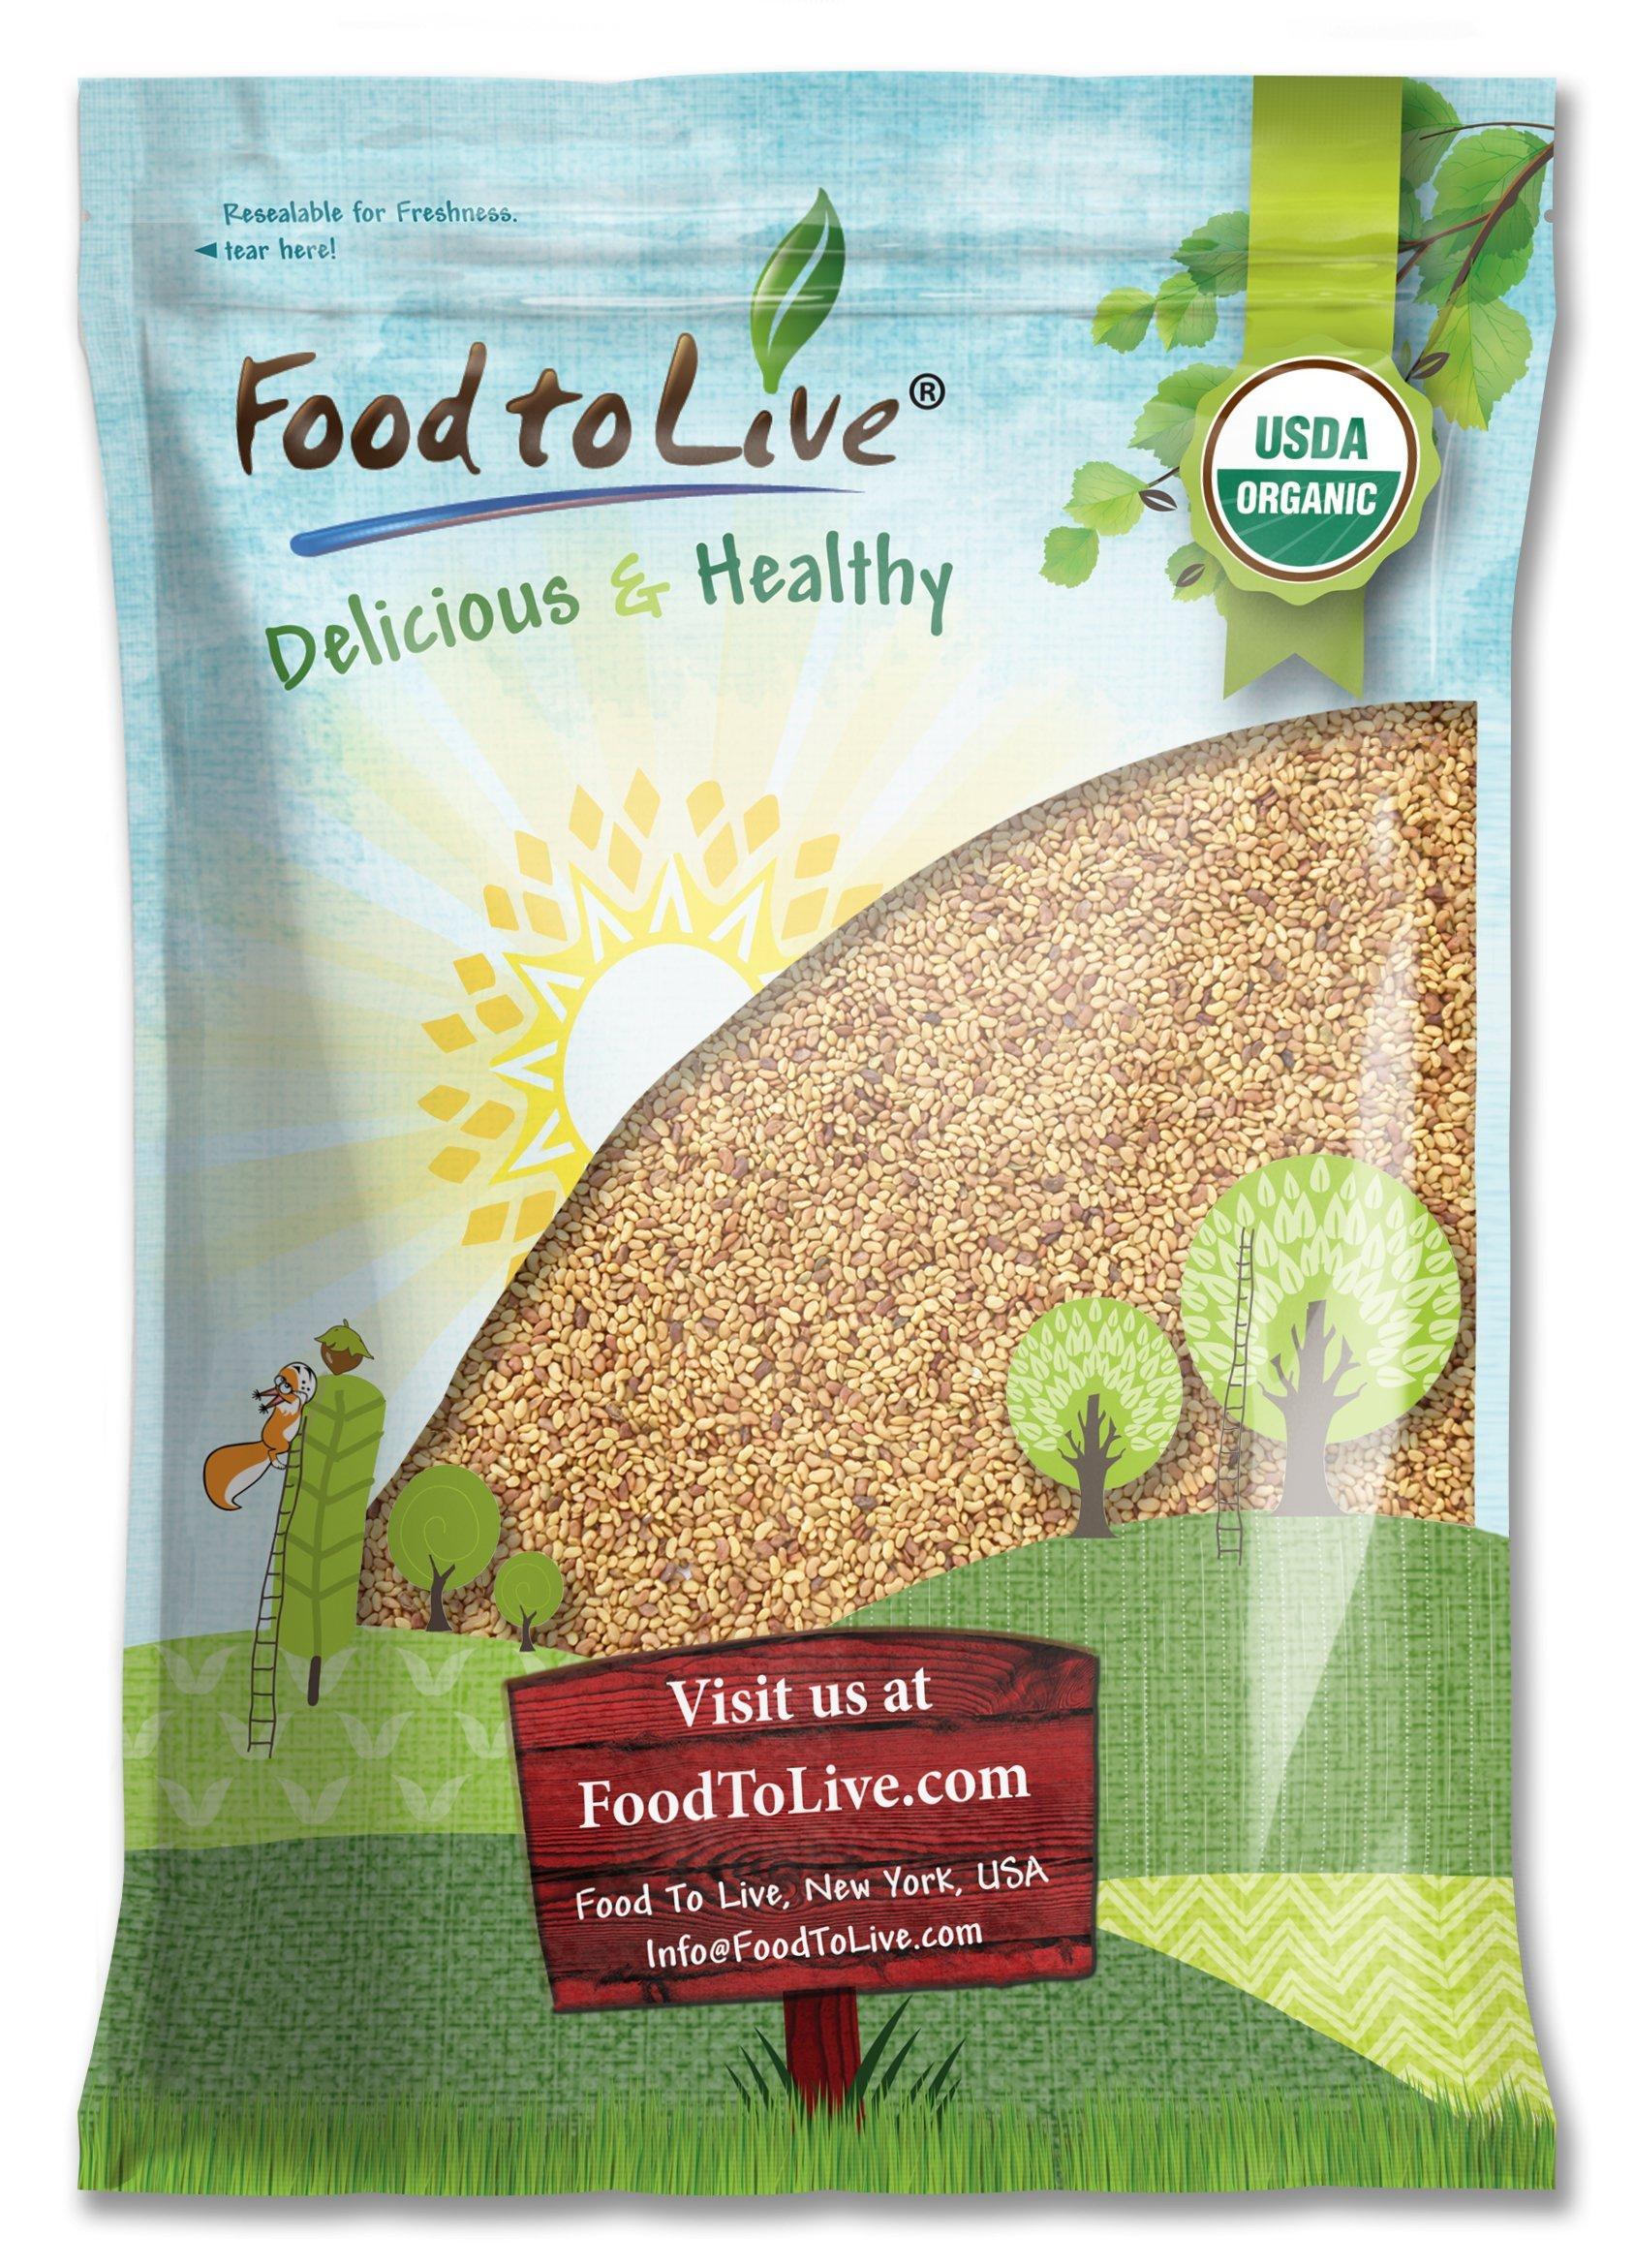 Organic Alfalfa Sprouting Seeds, 10 Pounds - Non-GMO, Kosher, Raw, Vegan, Bulk by Food to Live (Image #1)